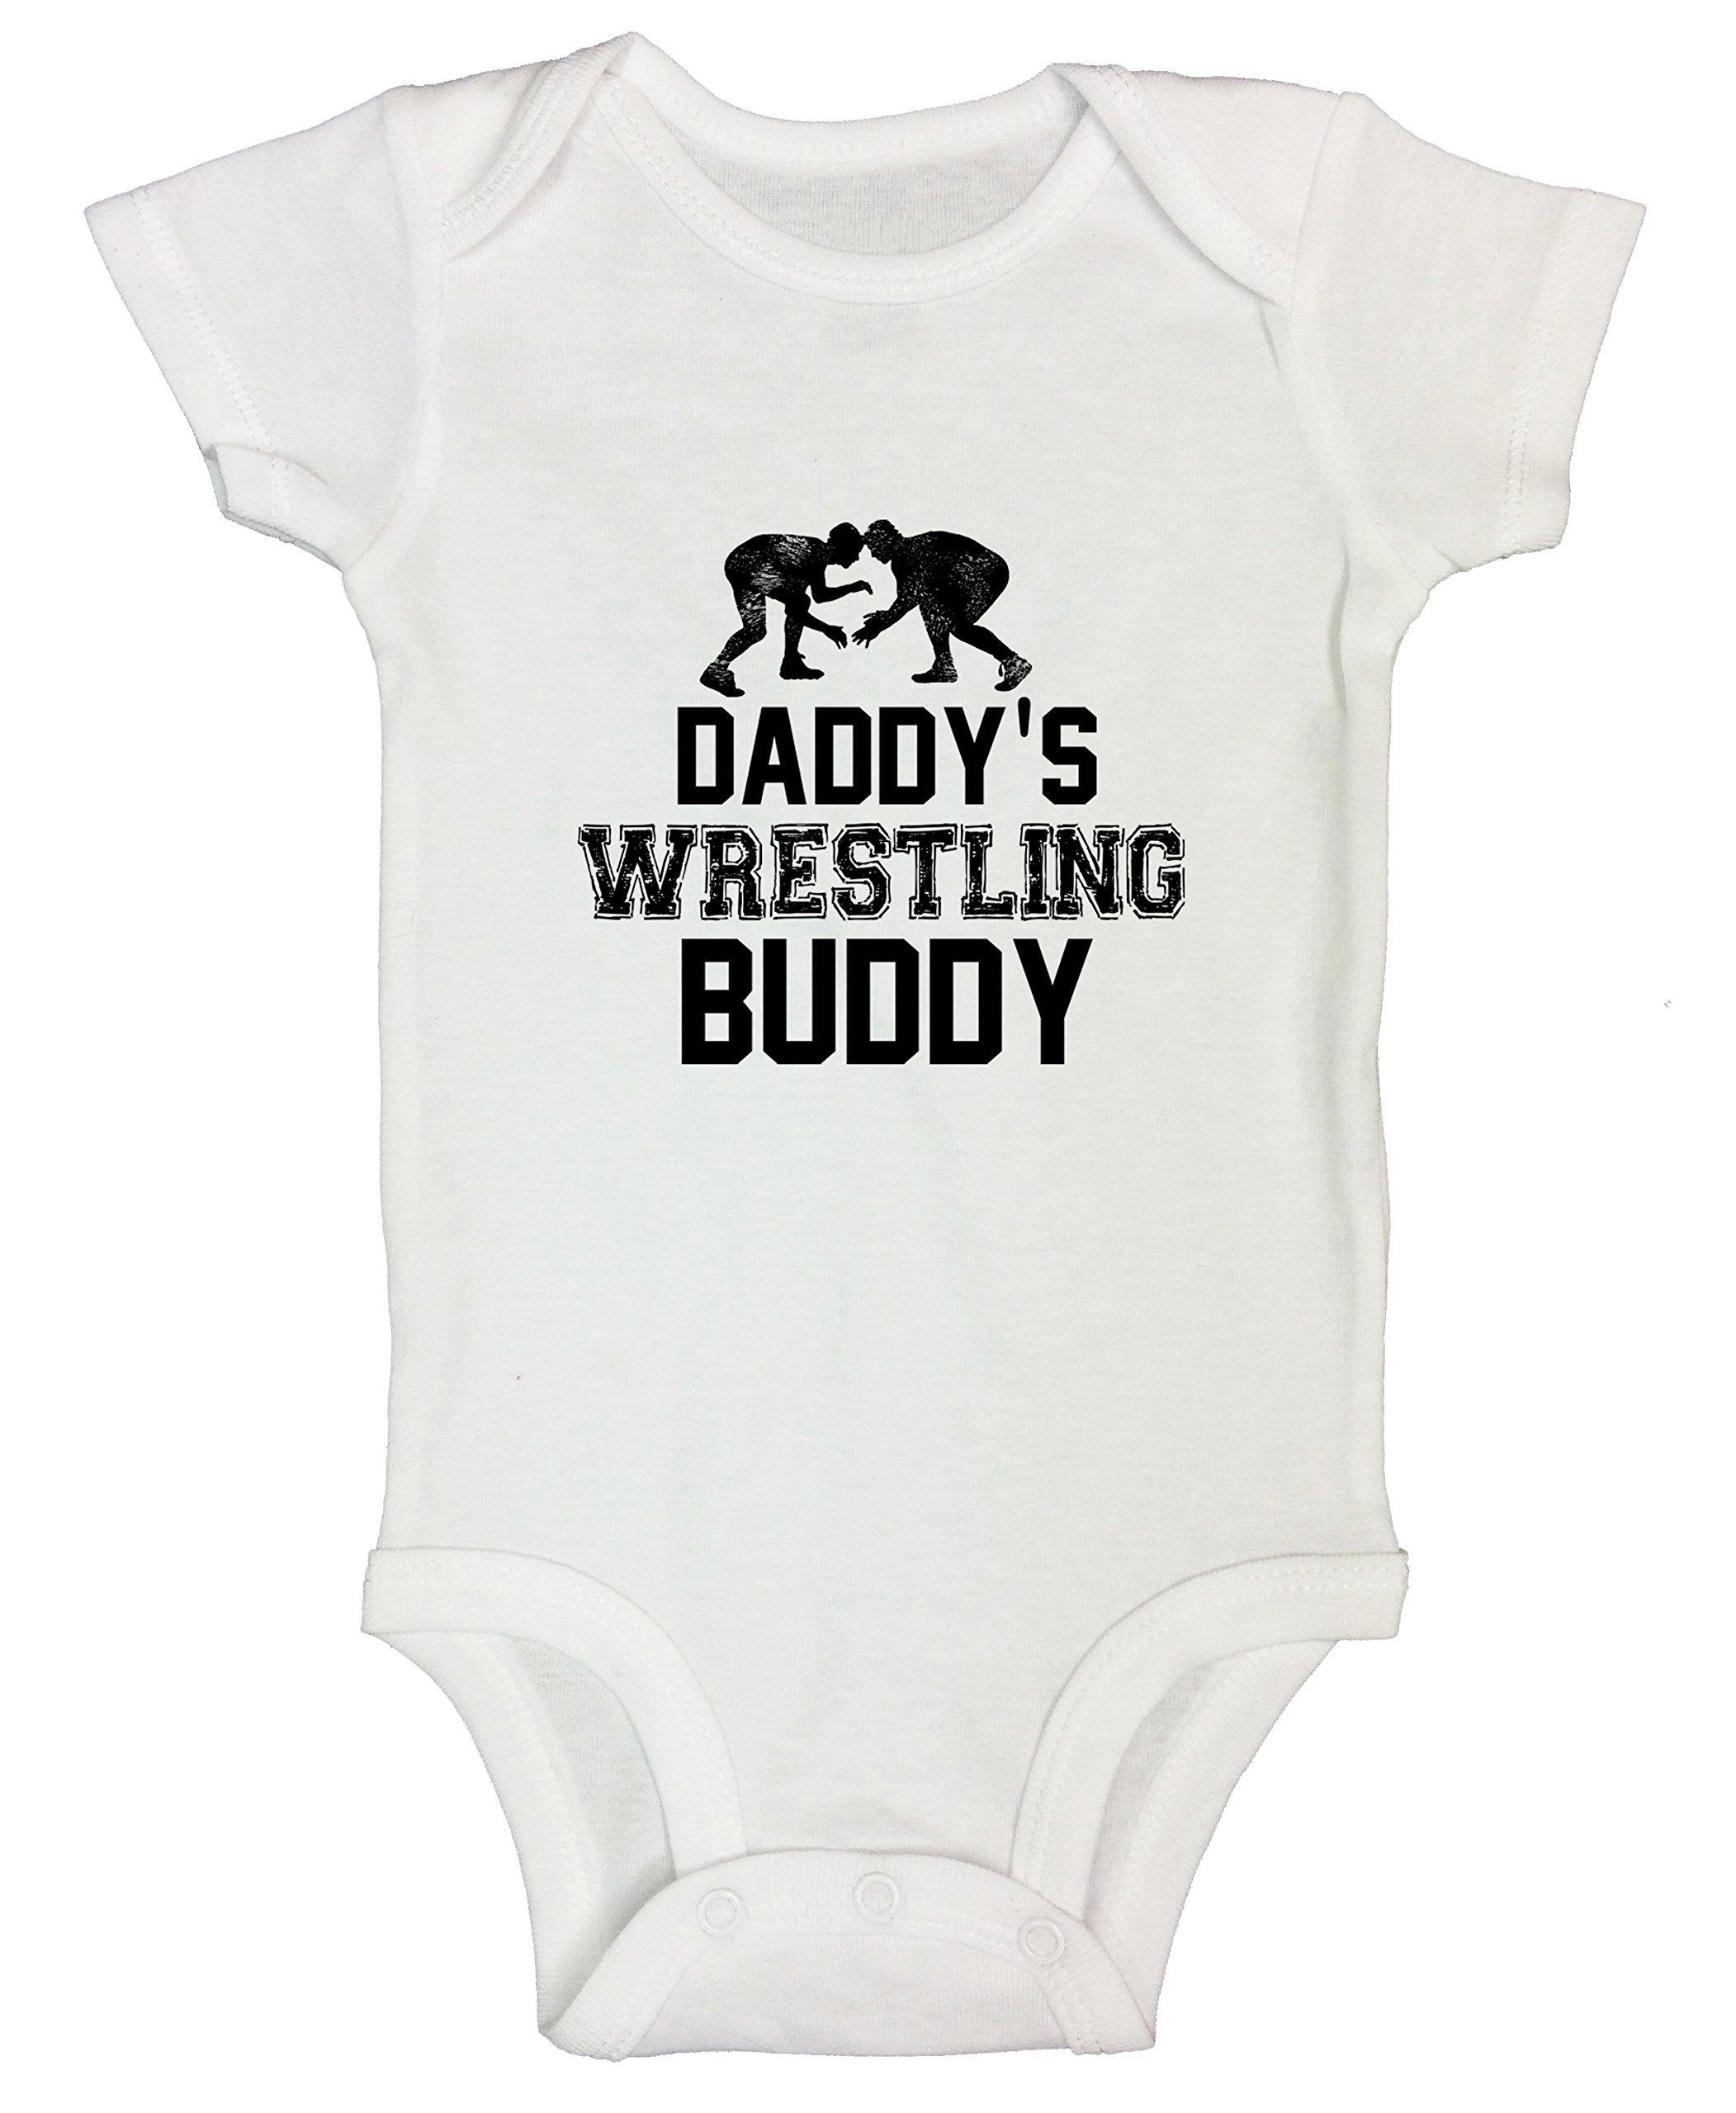 "Funny Boy Onesie Bodysuit ""Daddy Wrestling Buddy"" Gift for Daddy - Funny Threadz Kids 0-3 Months, White"